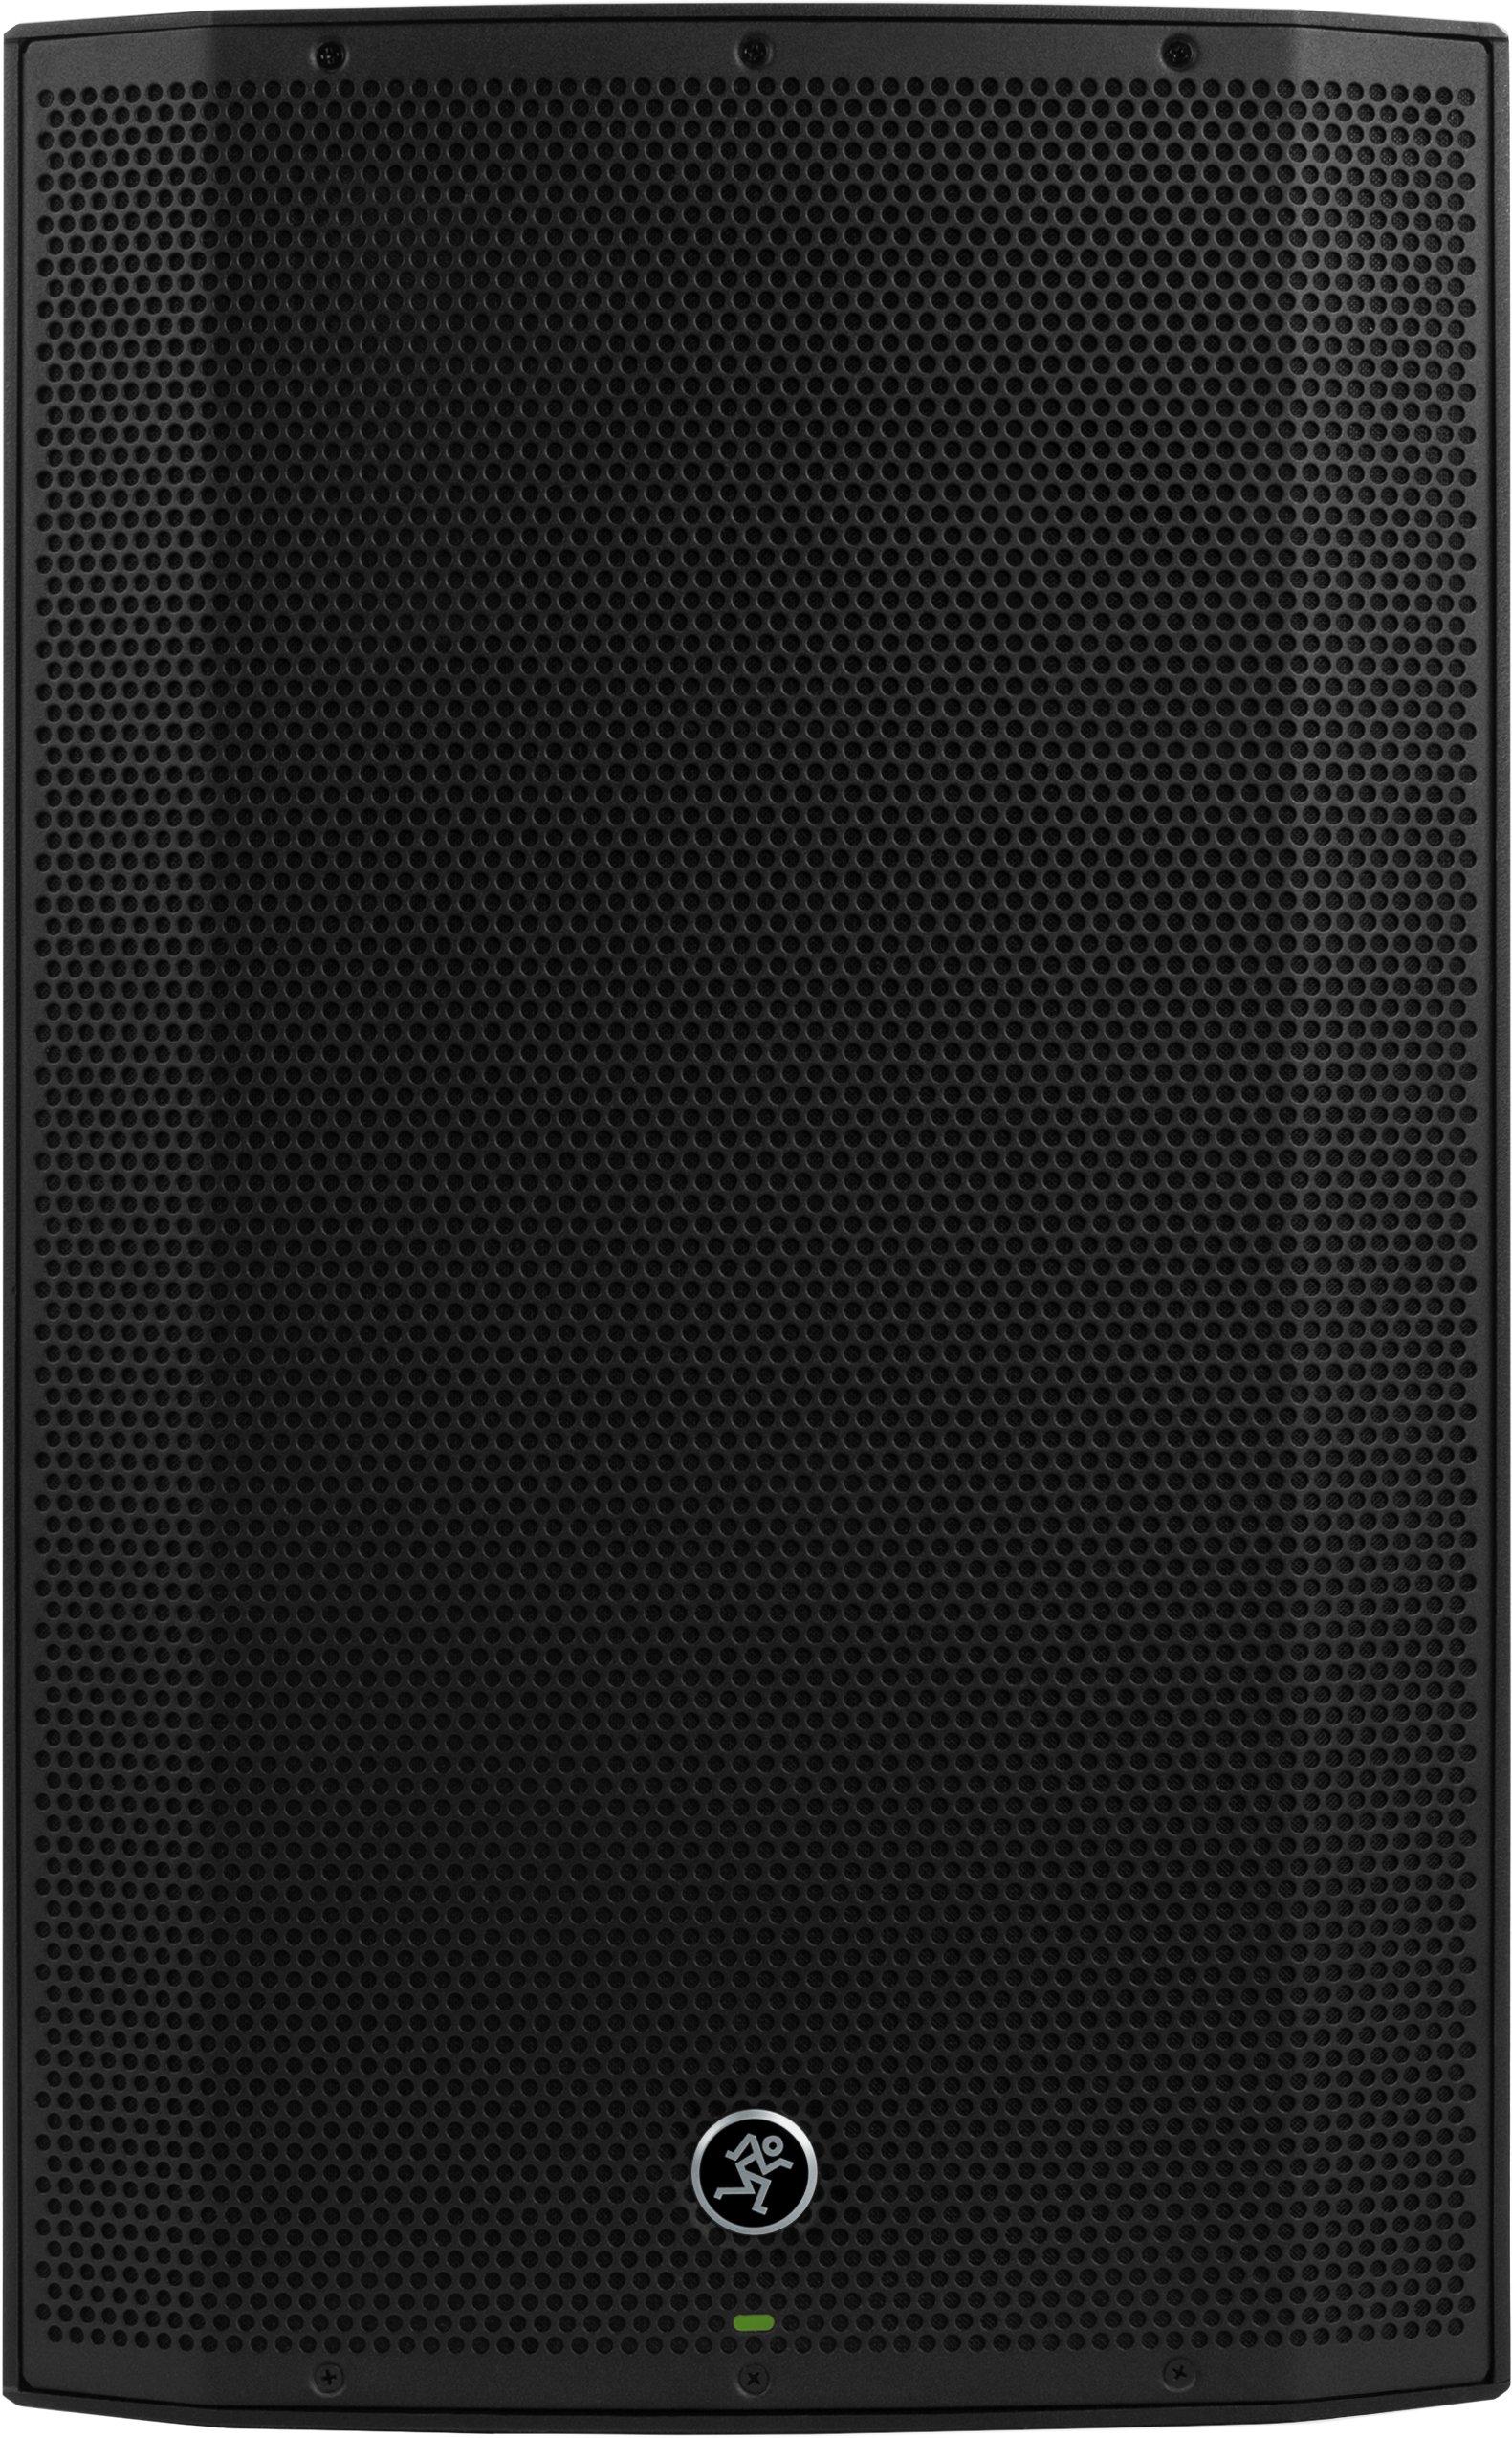 "Mackie Thump15BST - 1300W 15"" Advanced Powered Loudspeaker product image"